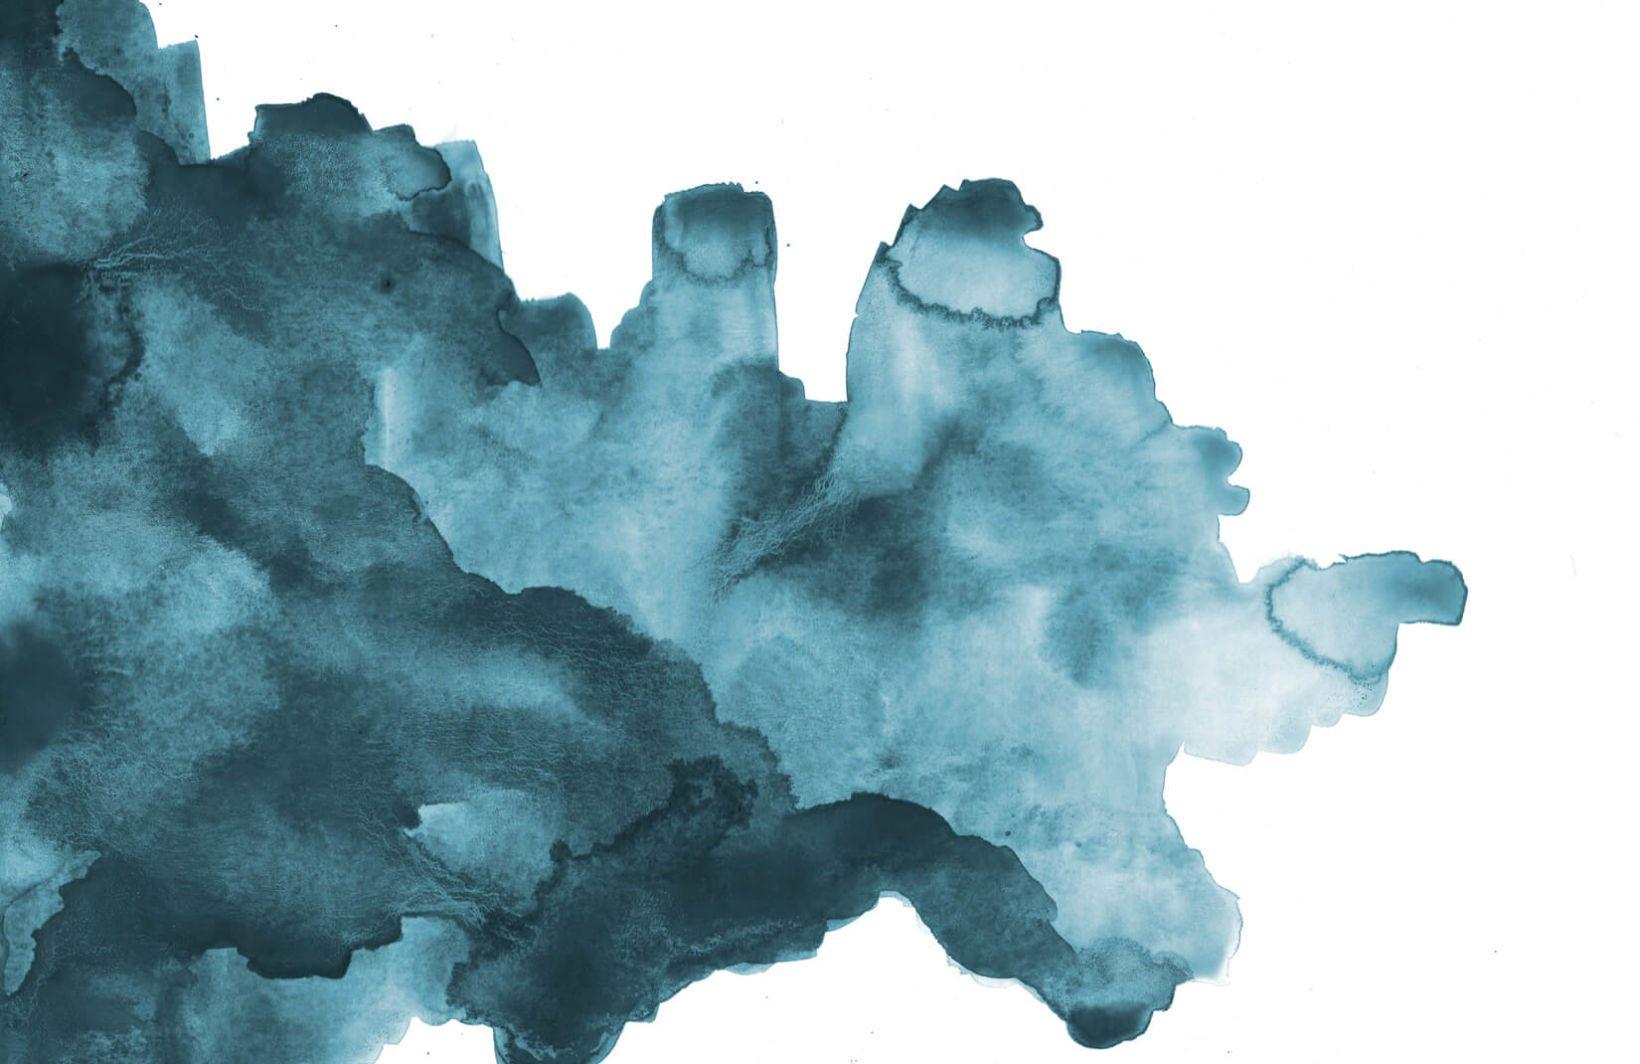 Papier Peint Tache Abstraite A L Aquarelle Bleu Canard Teal